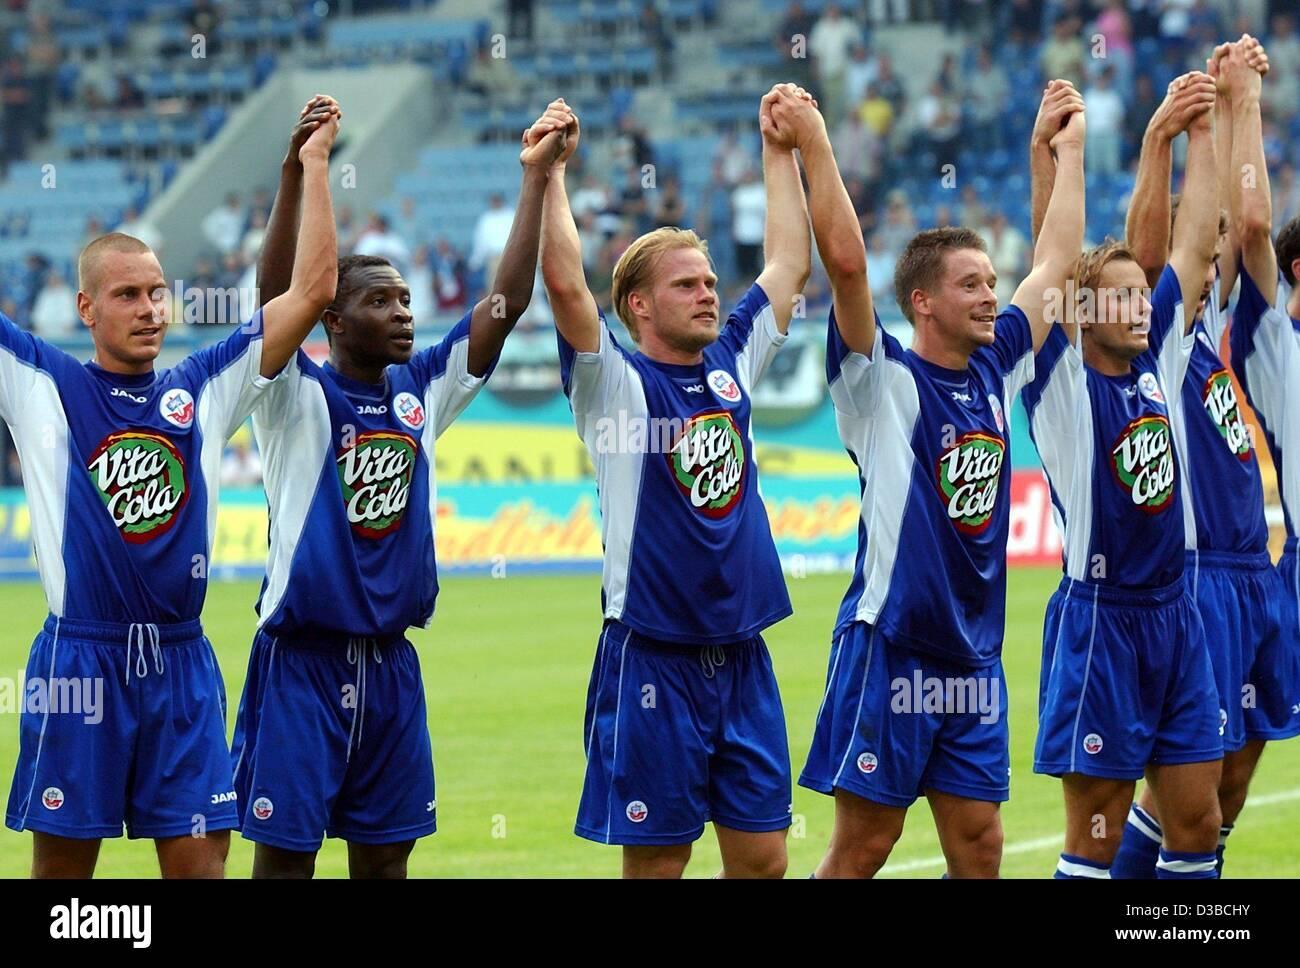 Dpa The Players Of German Soccer Club Fc Hansa Rostock Thank Stock Photo Alamy